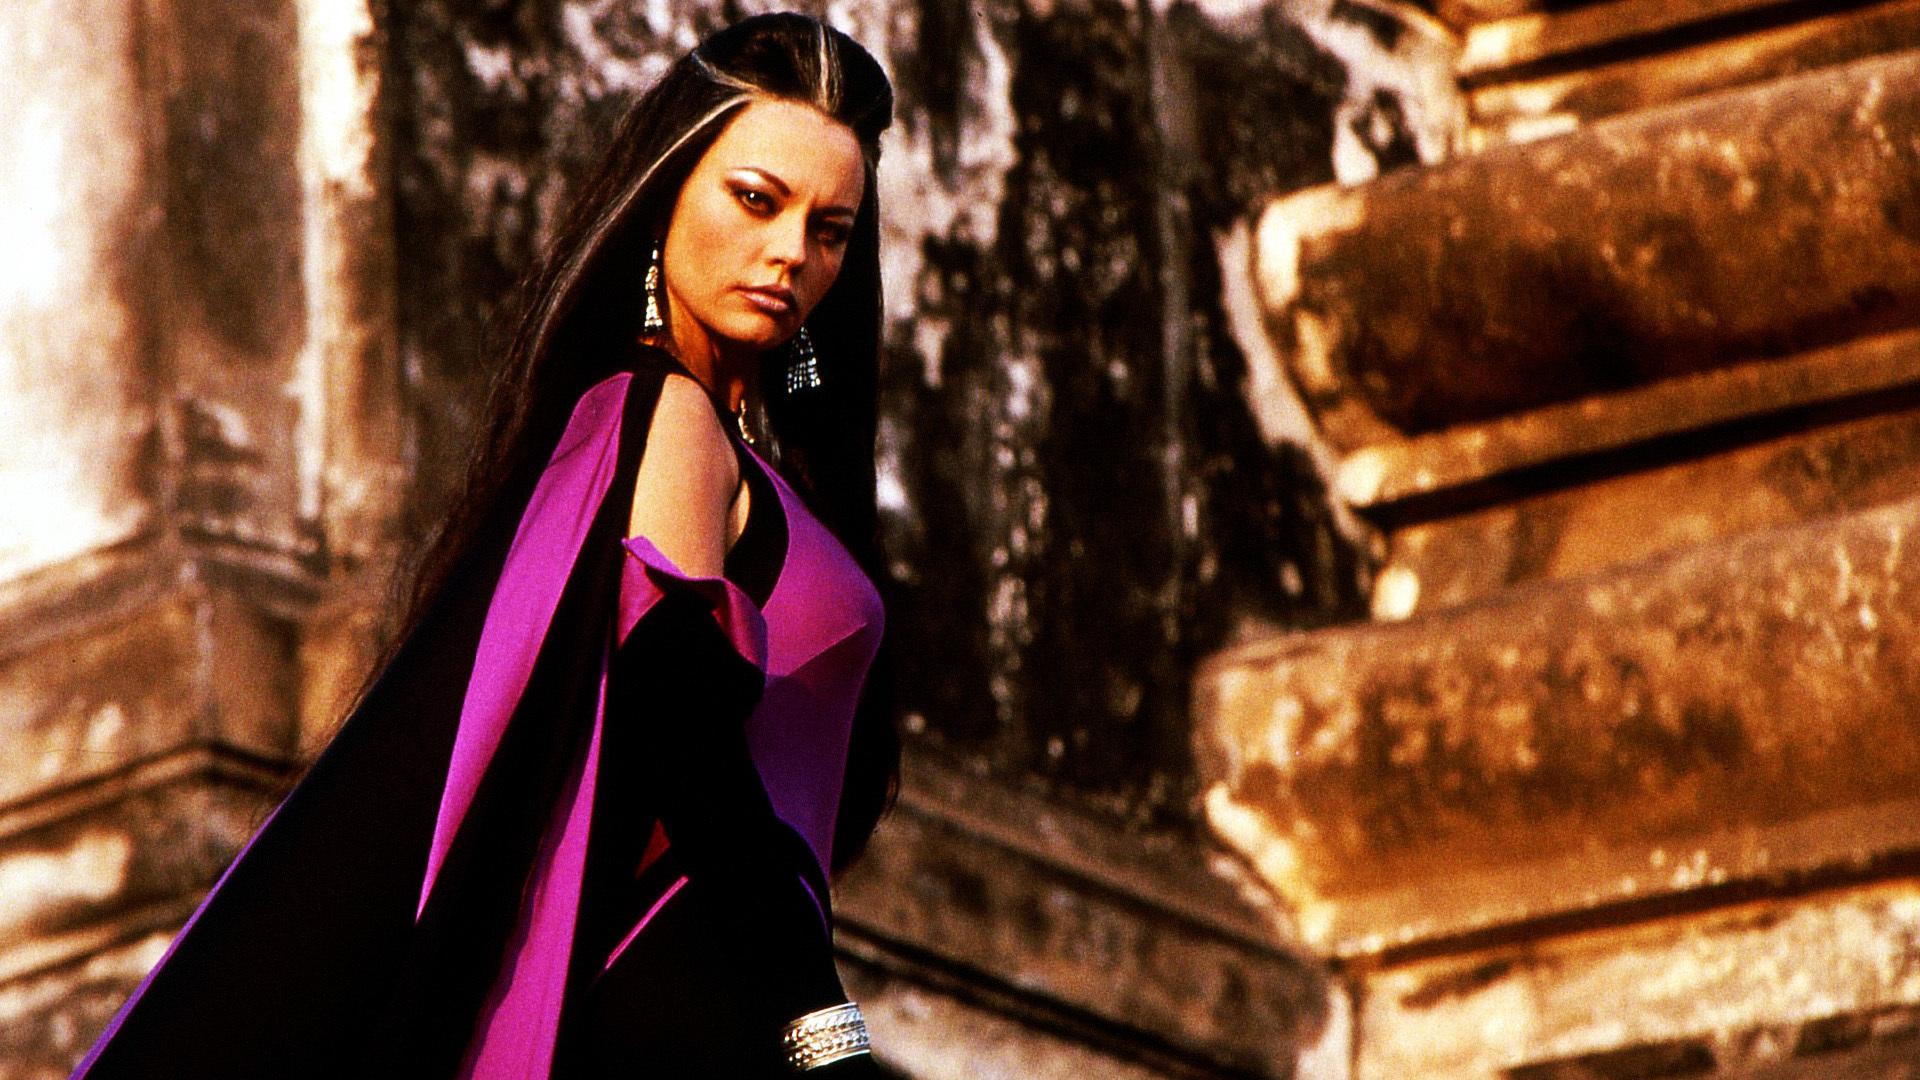 10 Hottest Mortal Kombat Female Characters | GAMERS DECIDE